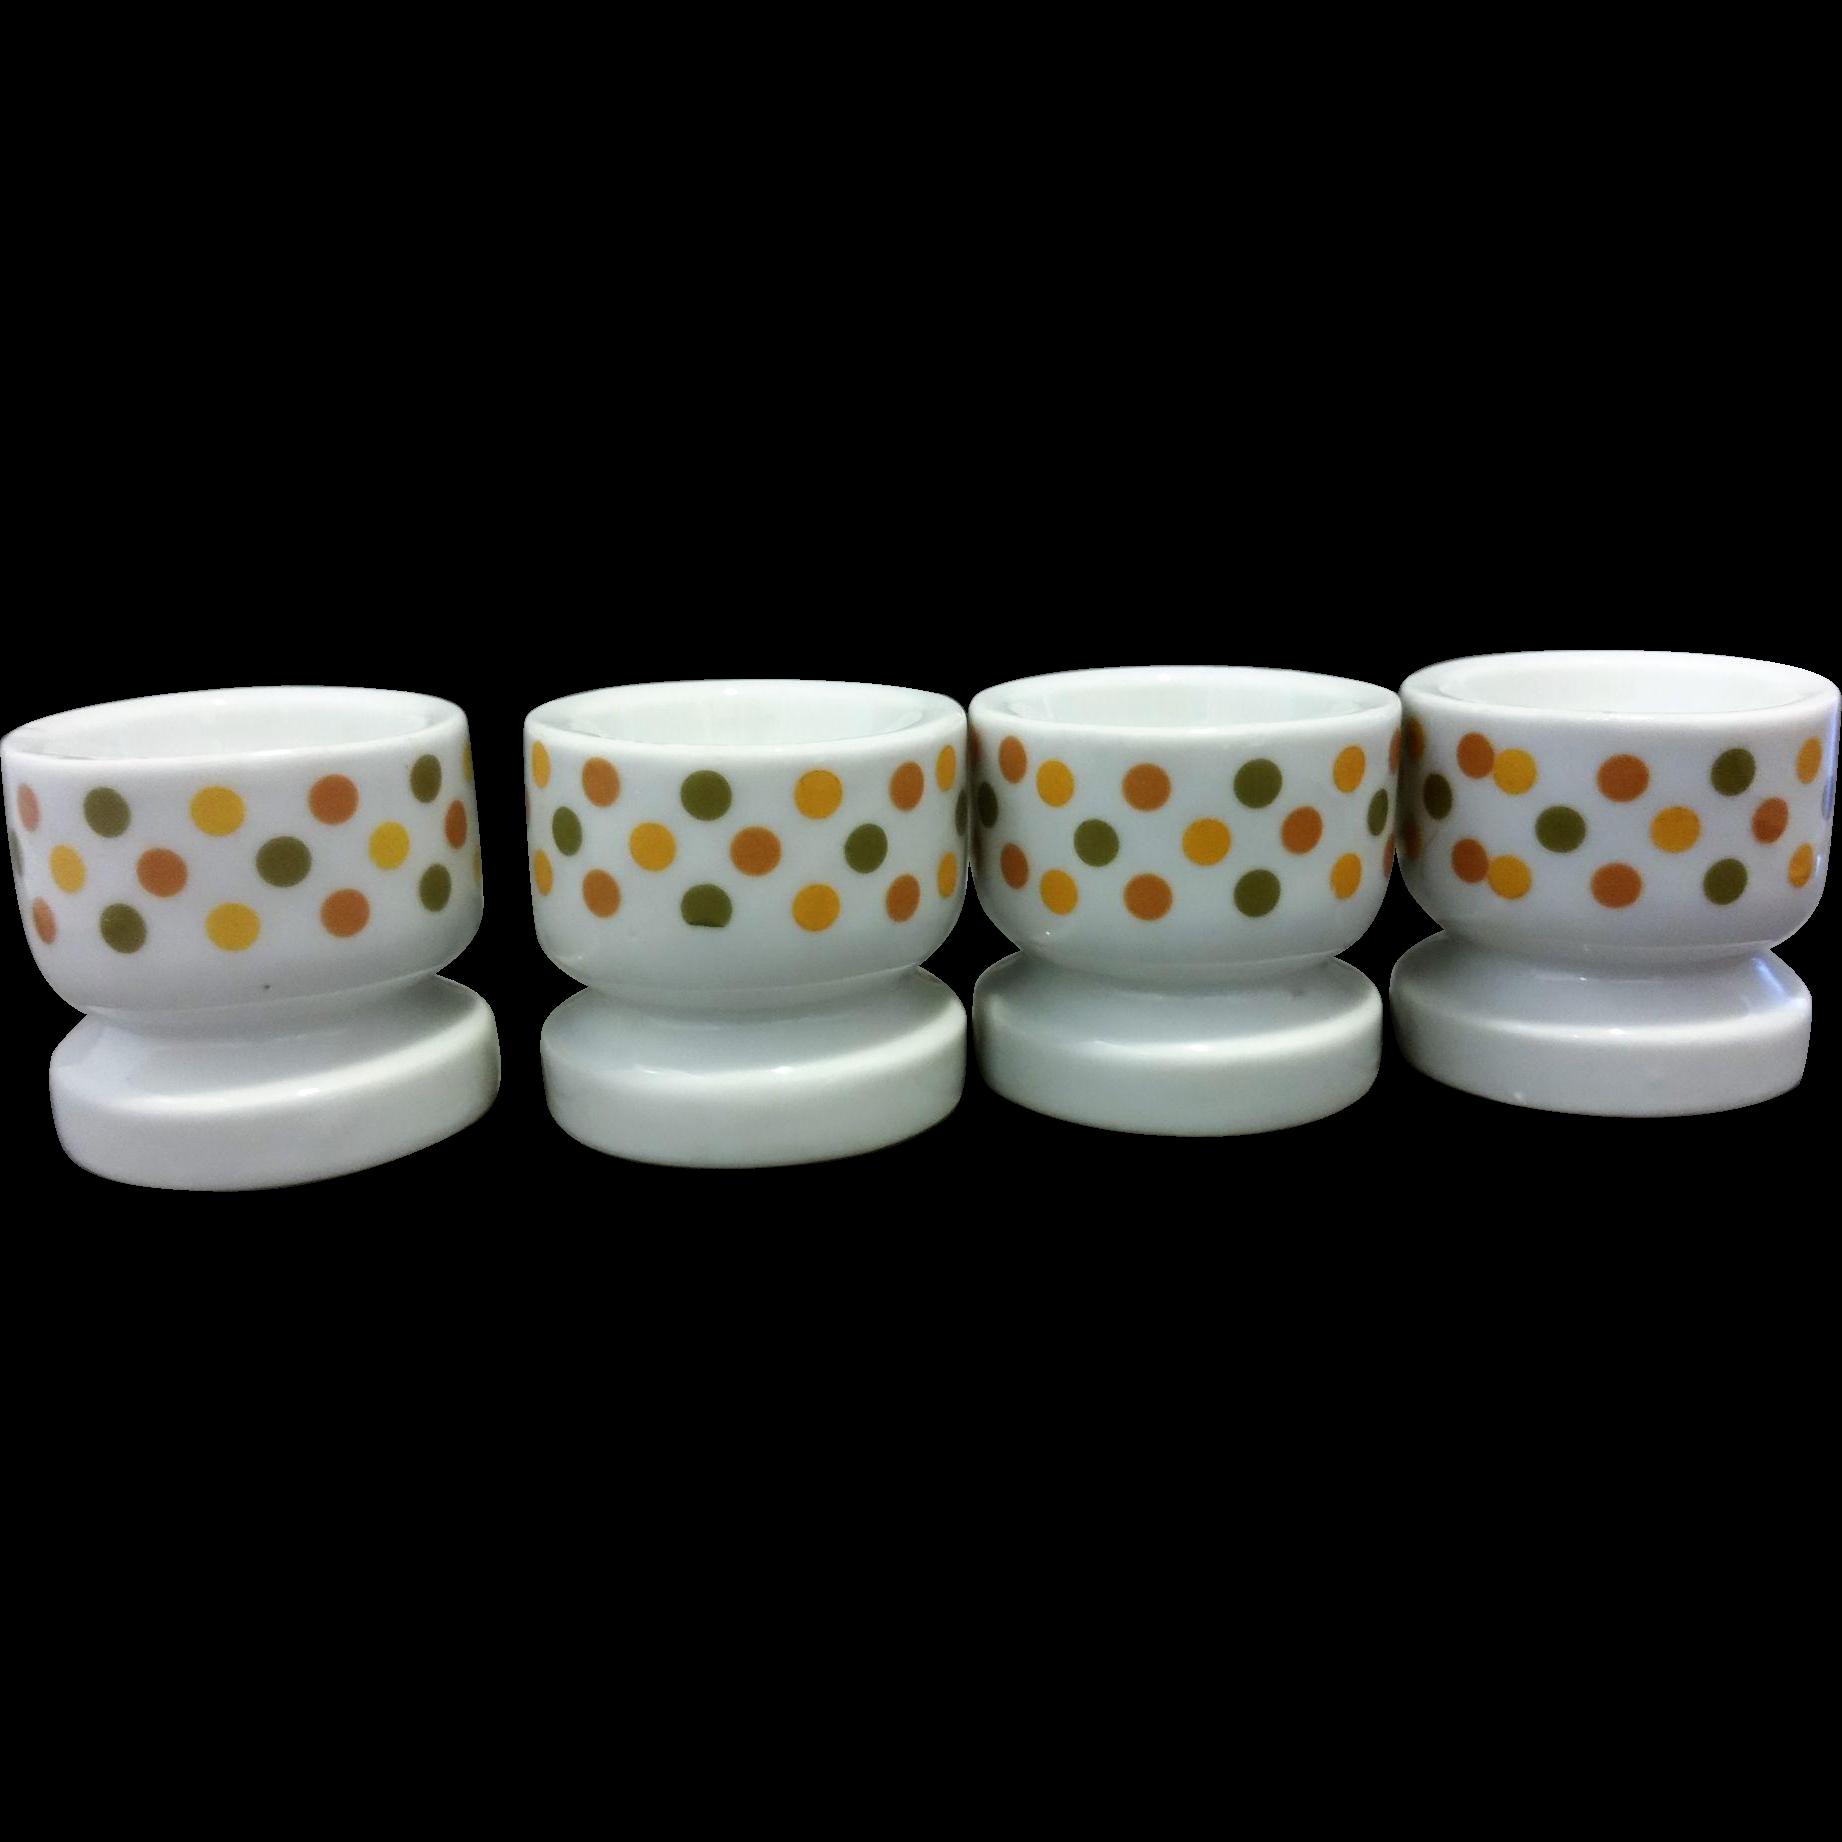 Polka Dot Earth Tones Ceramic Egg Cups Japan Set of 4